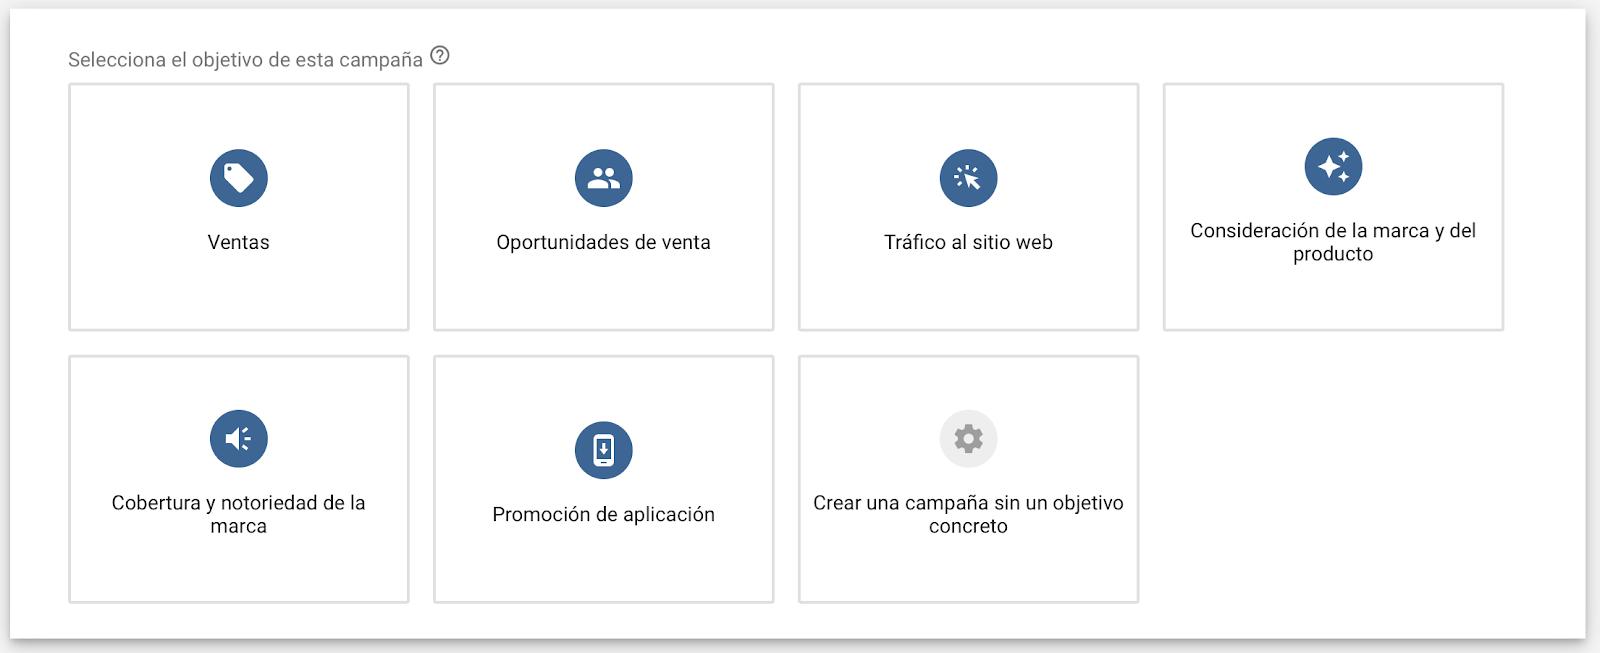 objetivos-campaña-google-ads